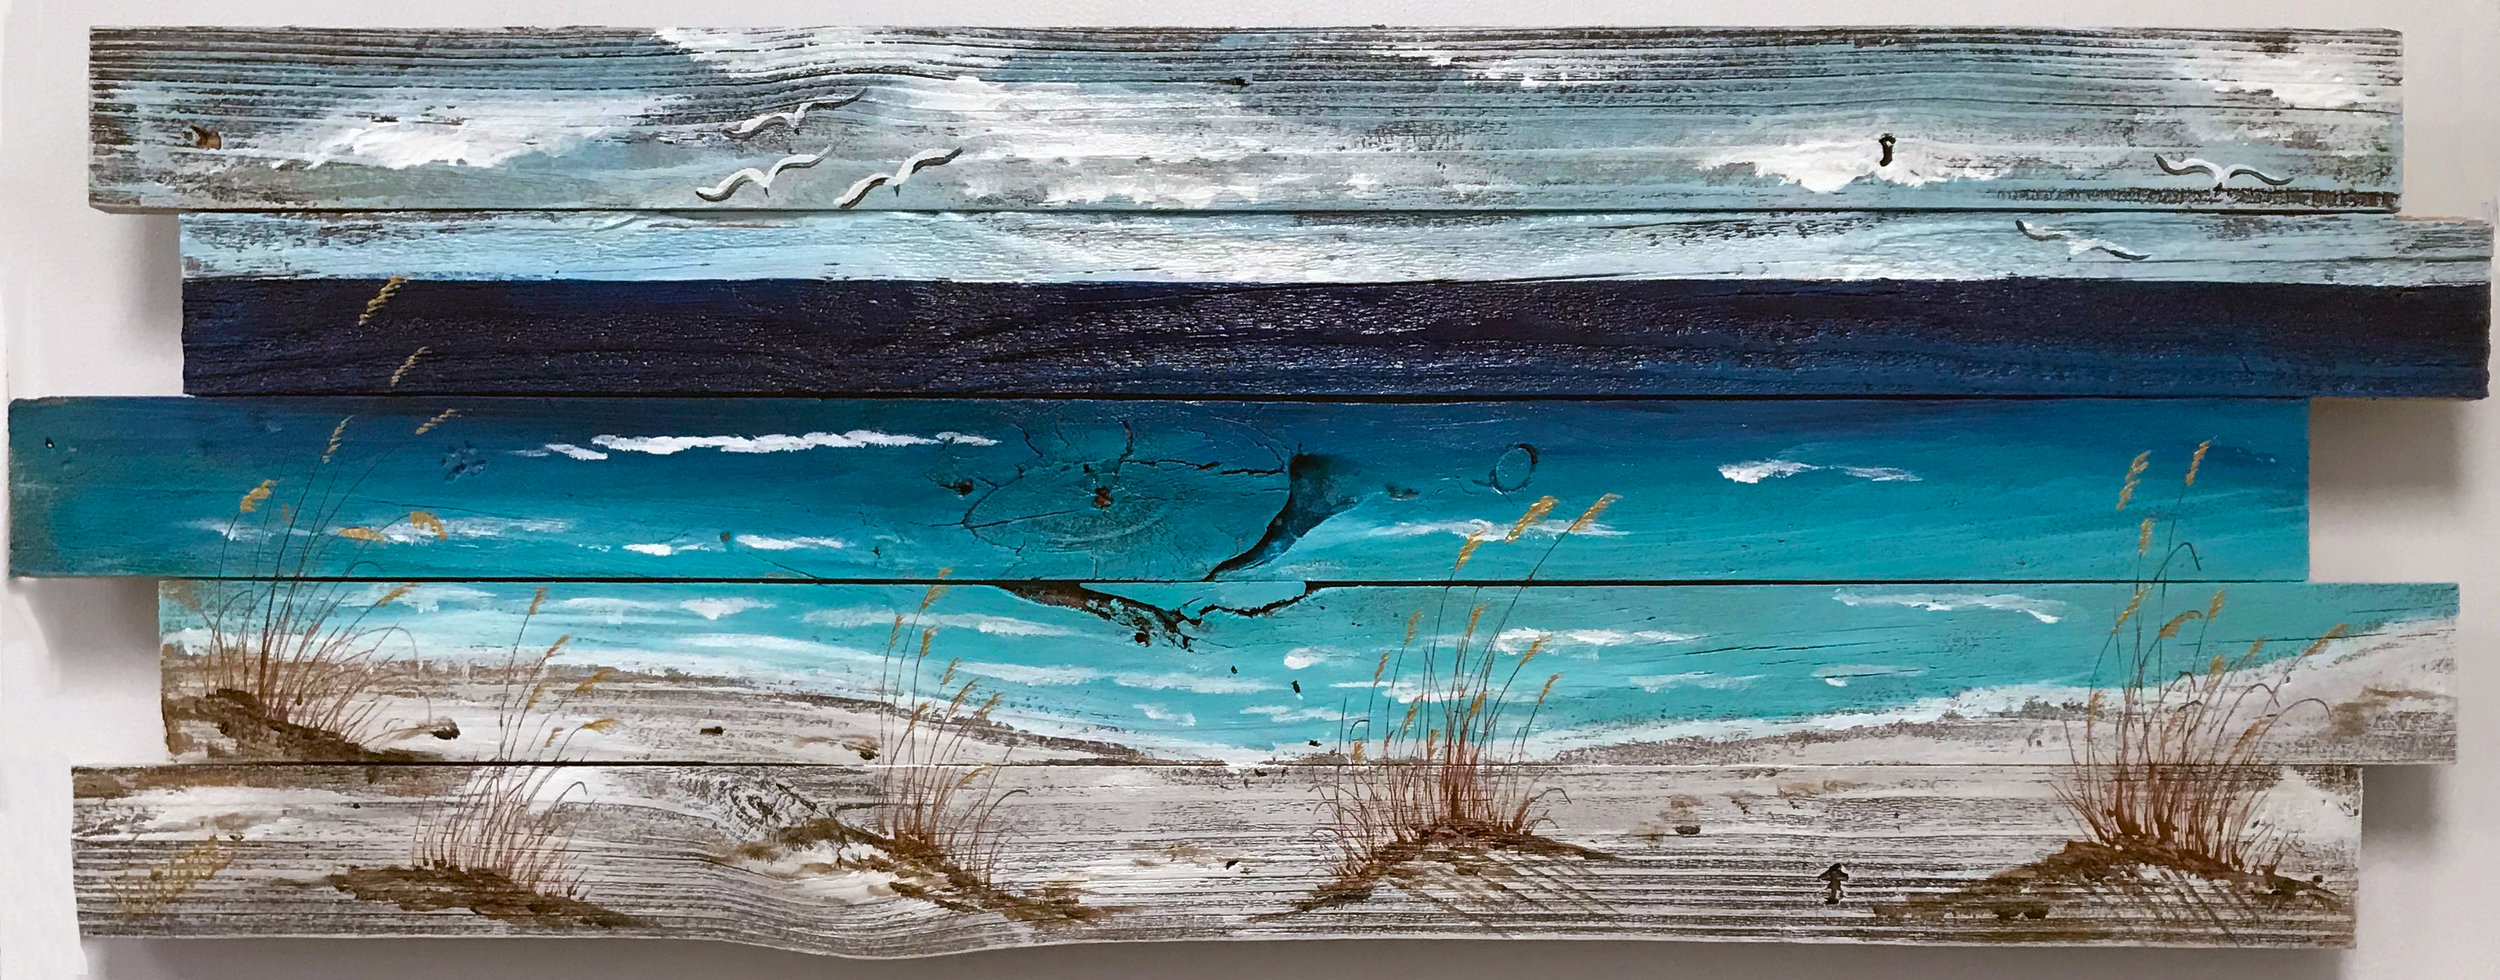 At the Beach - 201824x48 inchesacrylic on reclaimed fence board